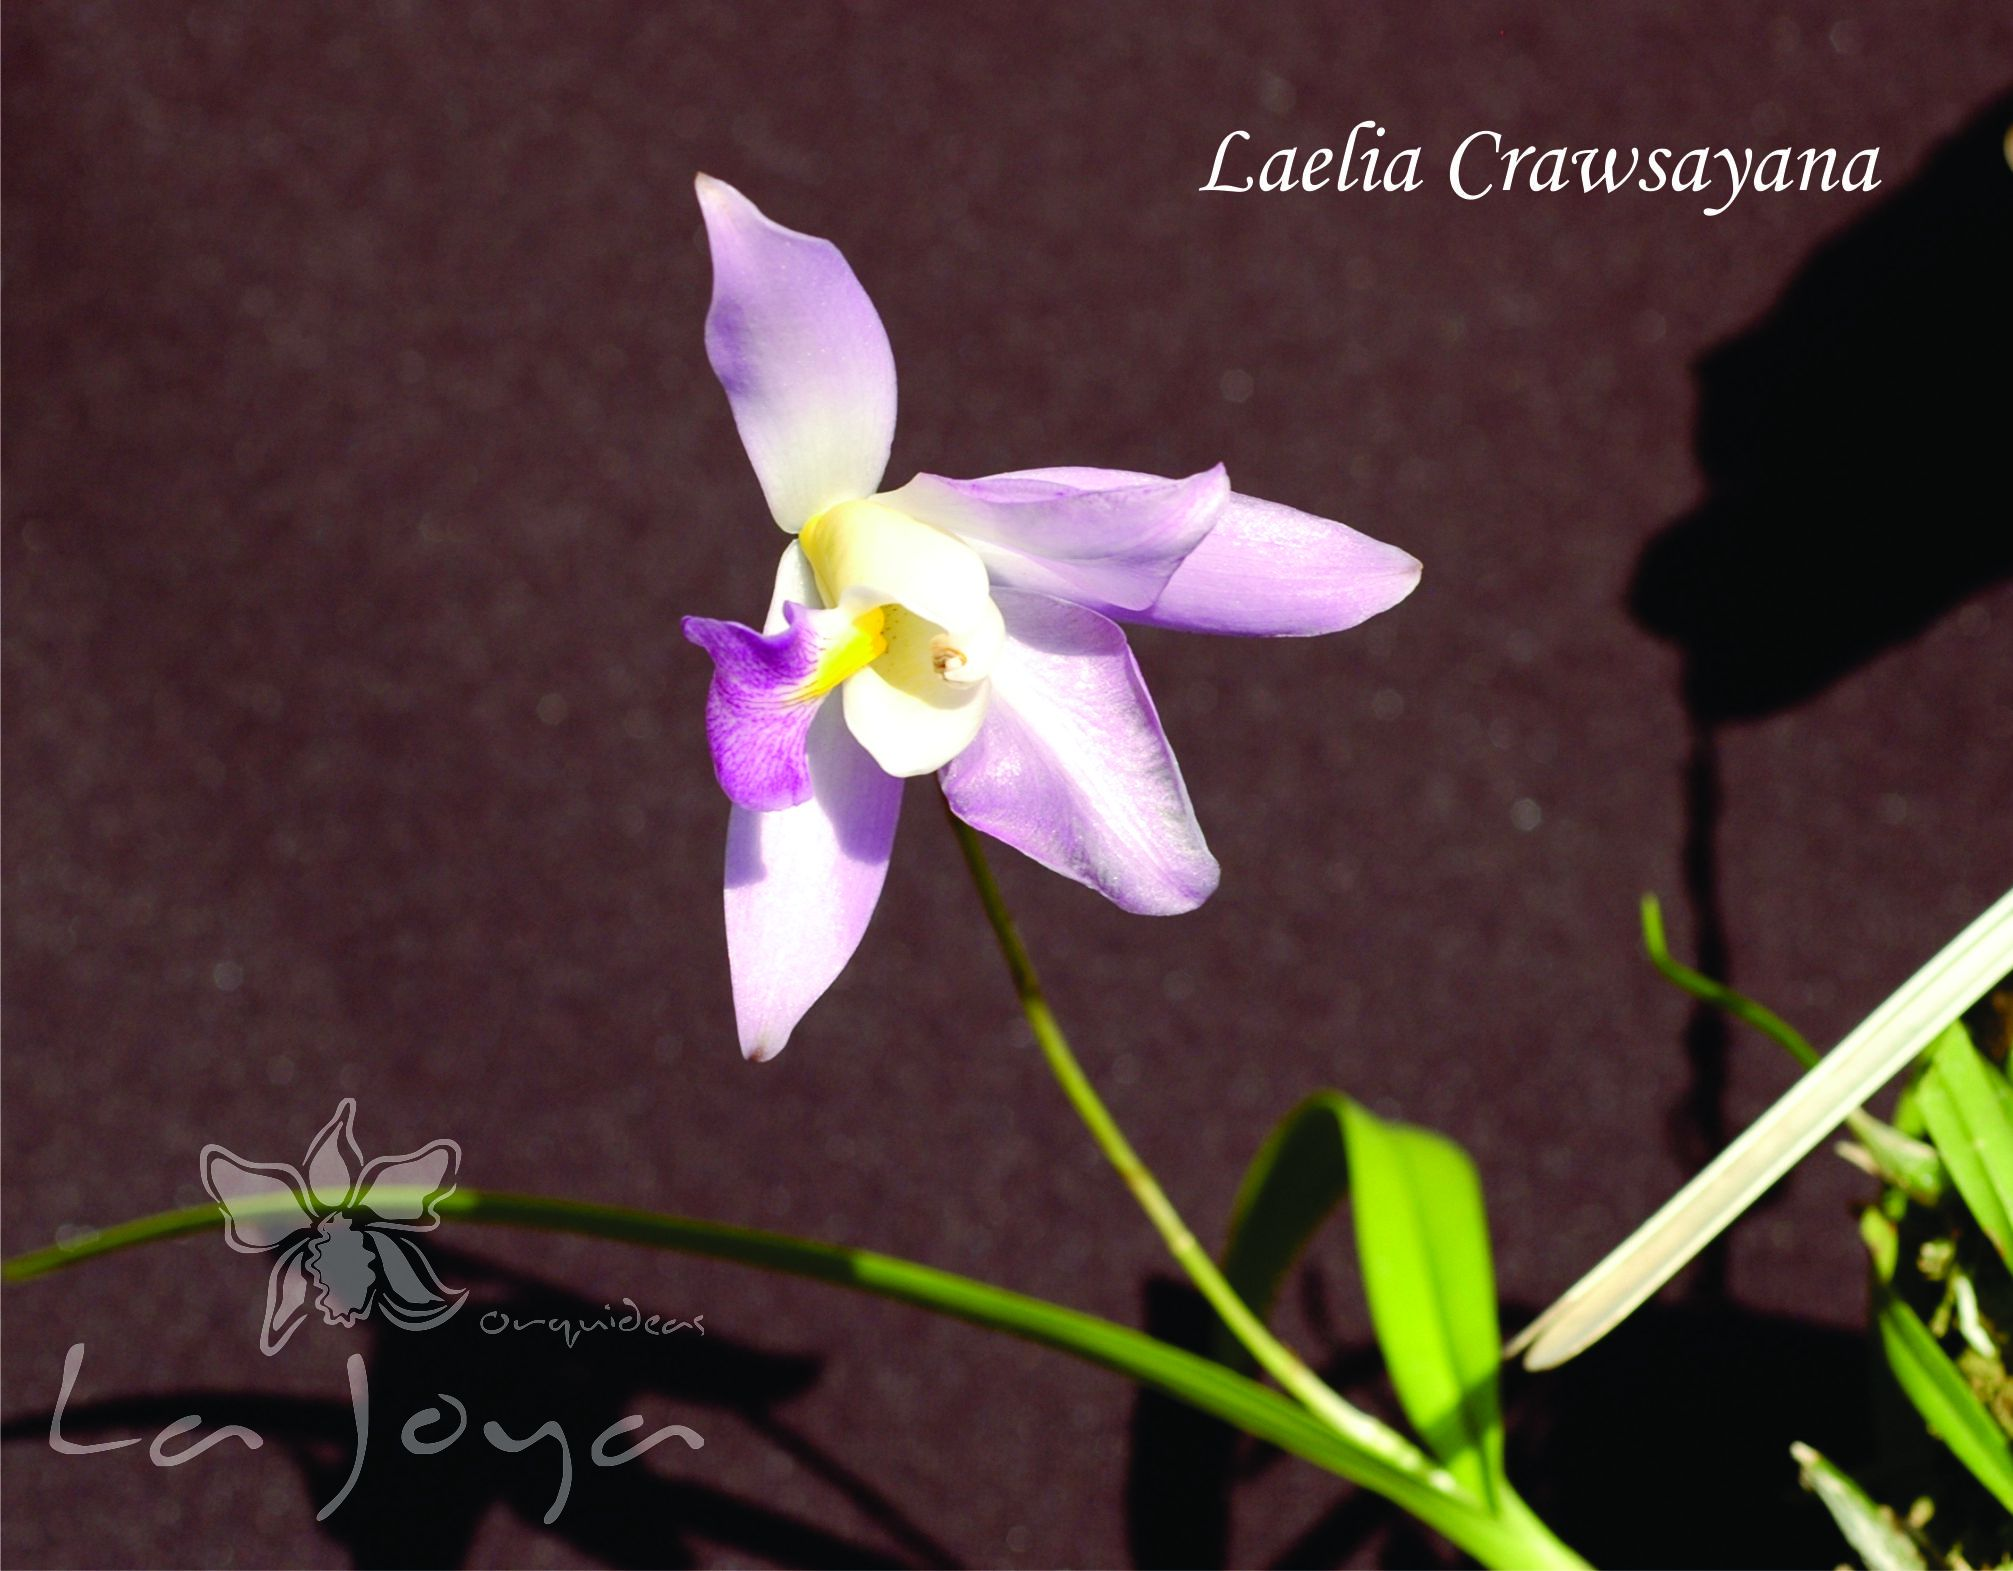 Laelia Crawsayana